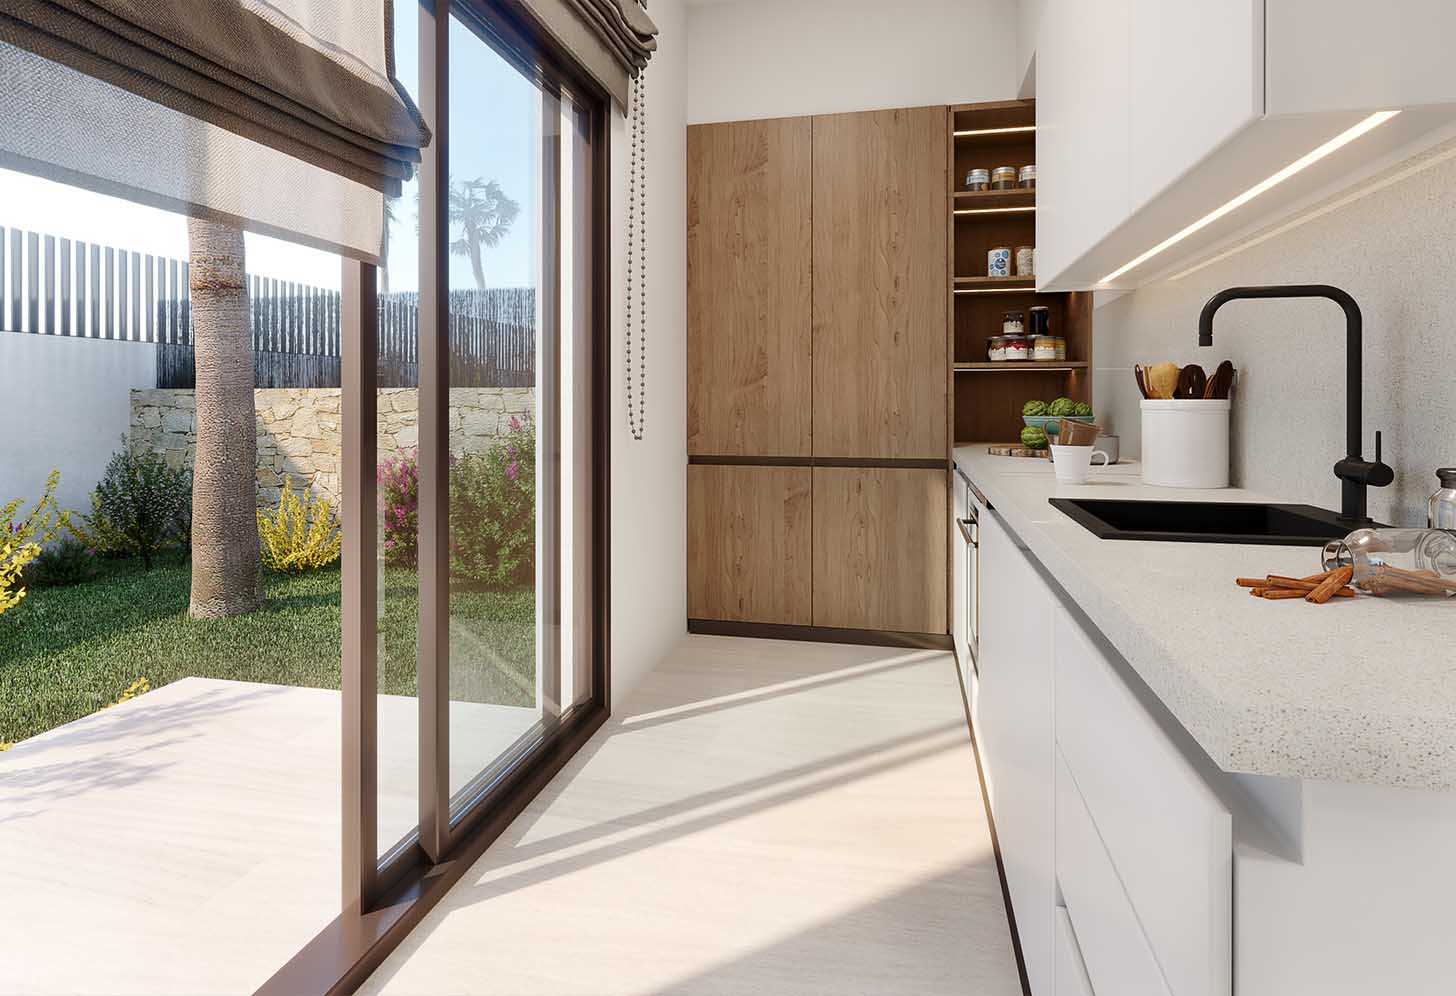 immobilier neuf espagne costa blanca on-o2 balcon finestrat cuisine